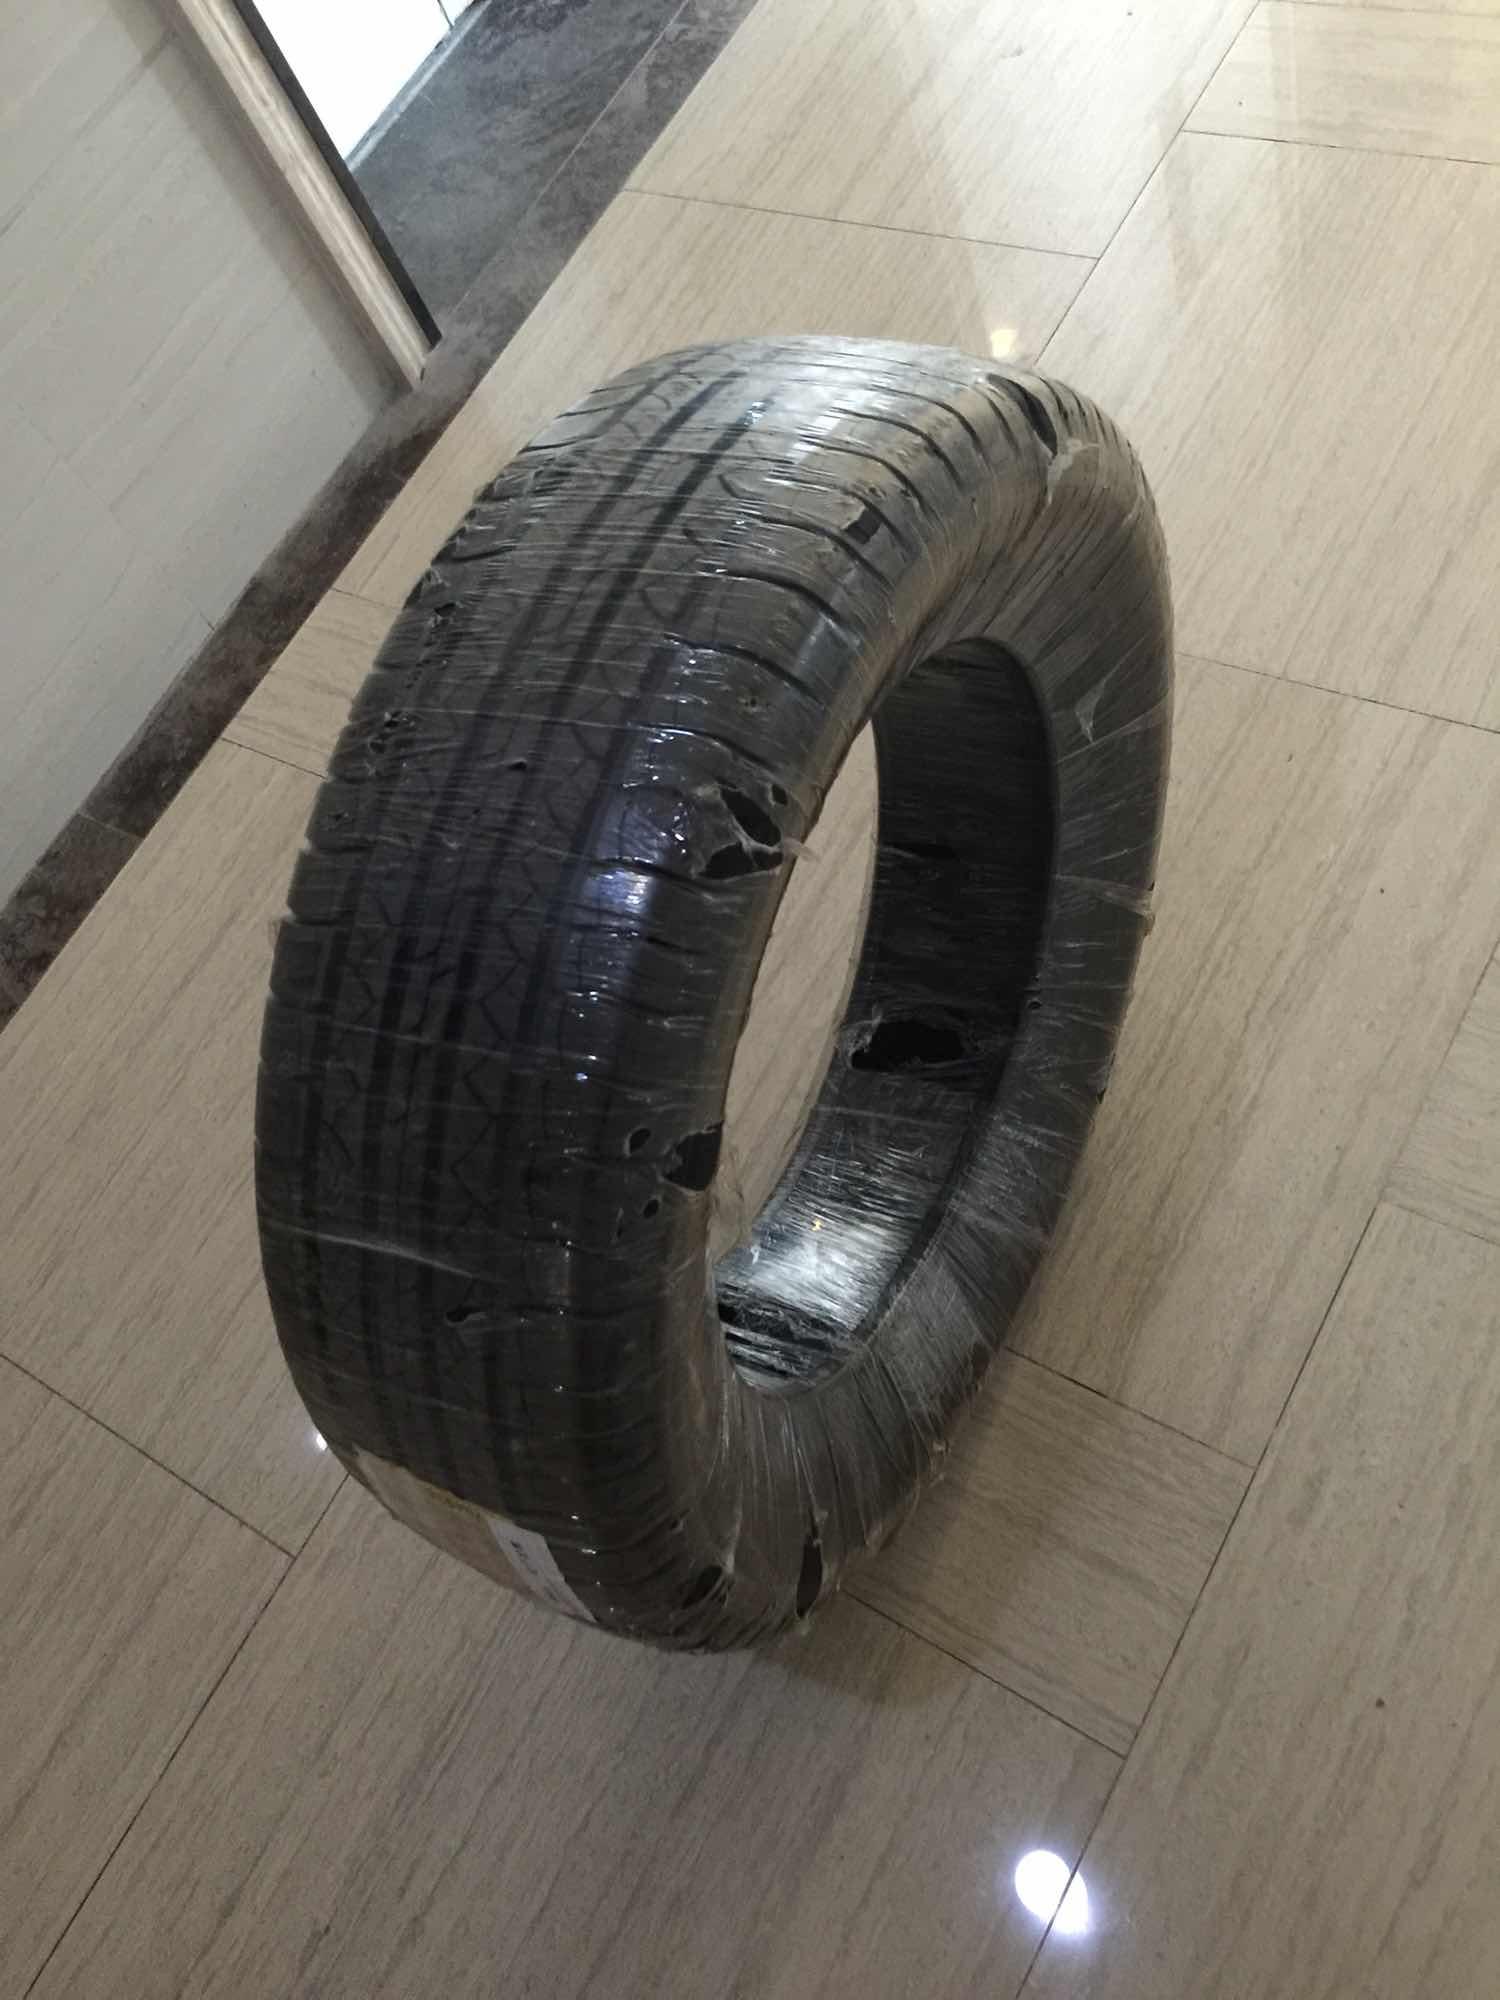 asics gel nimbus 14 mens running shoes 00984053 mall